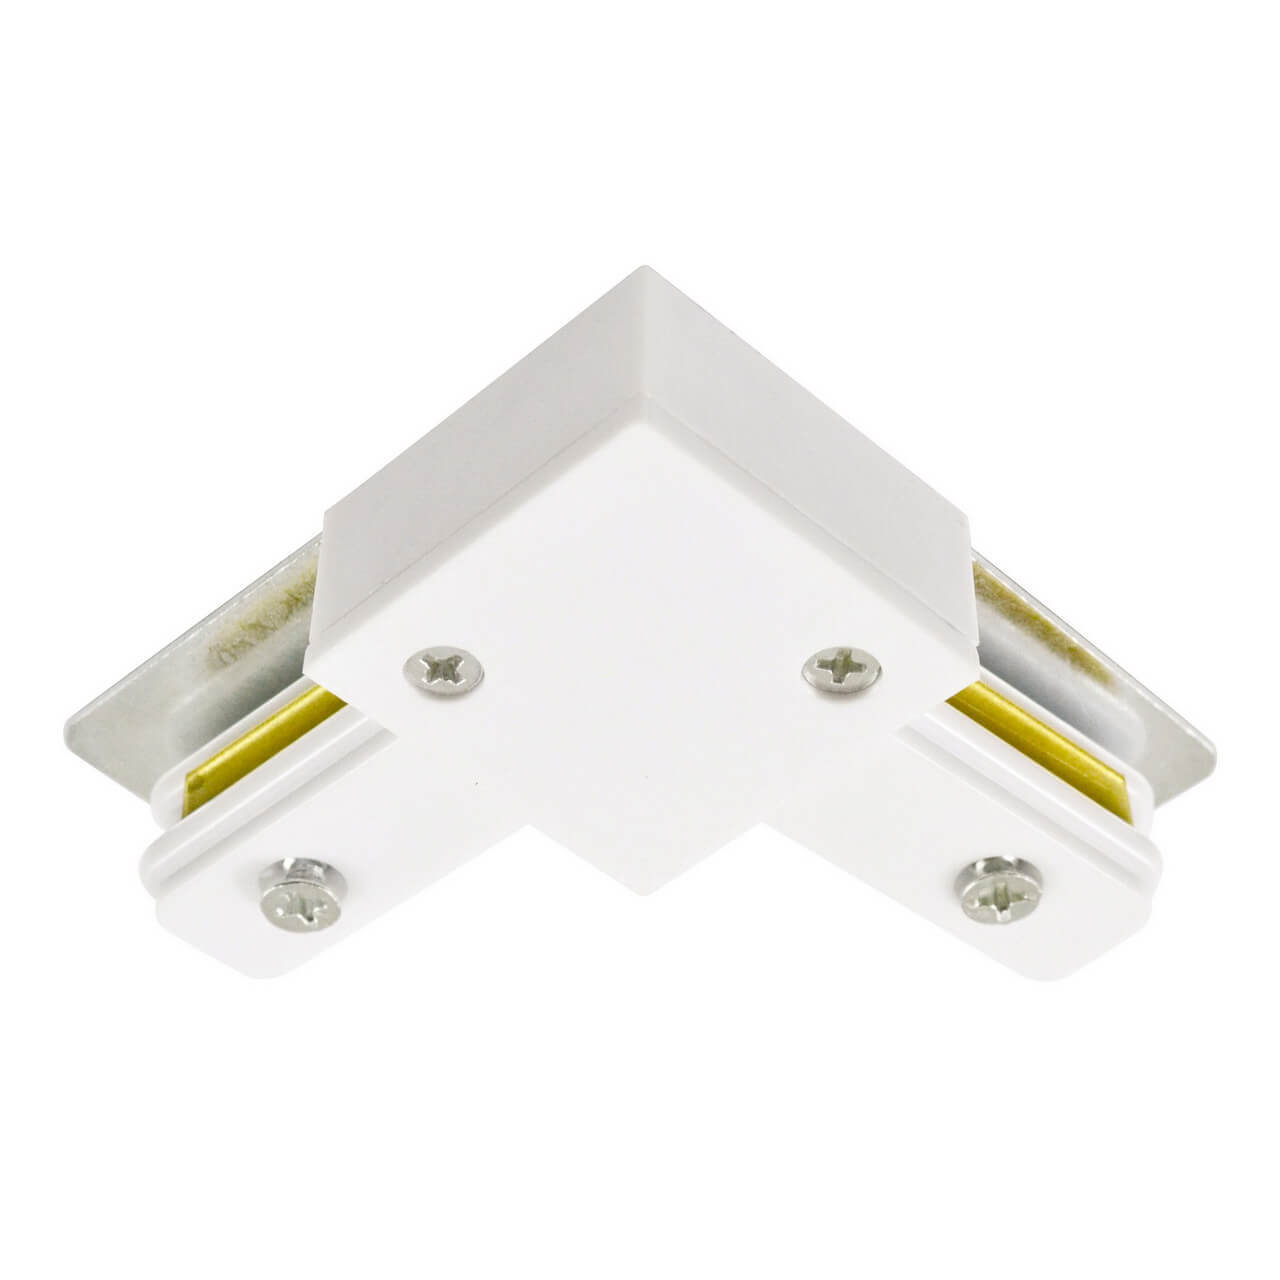 Коннектор для шинопровода Arte Lamp Track Accessories A120033 цена